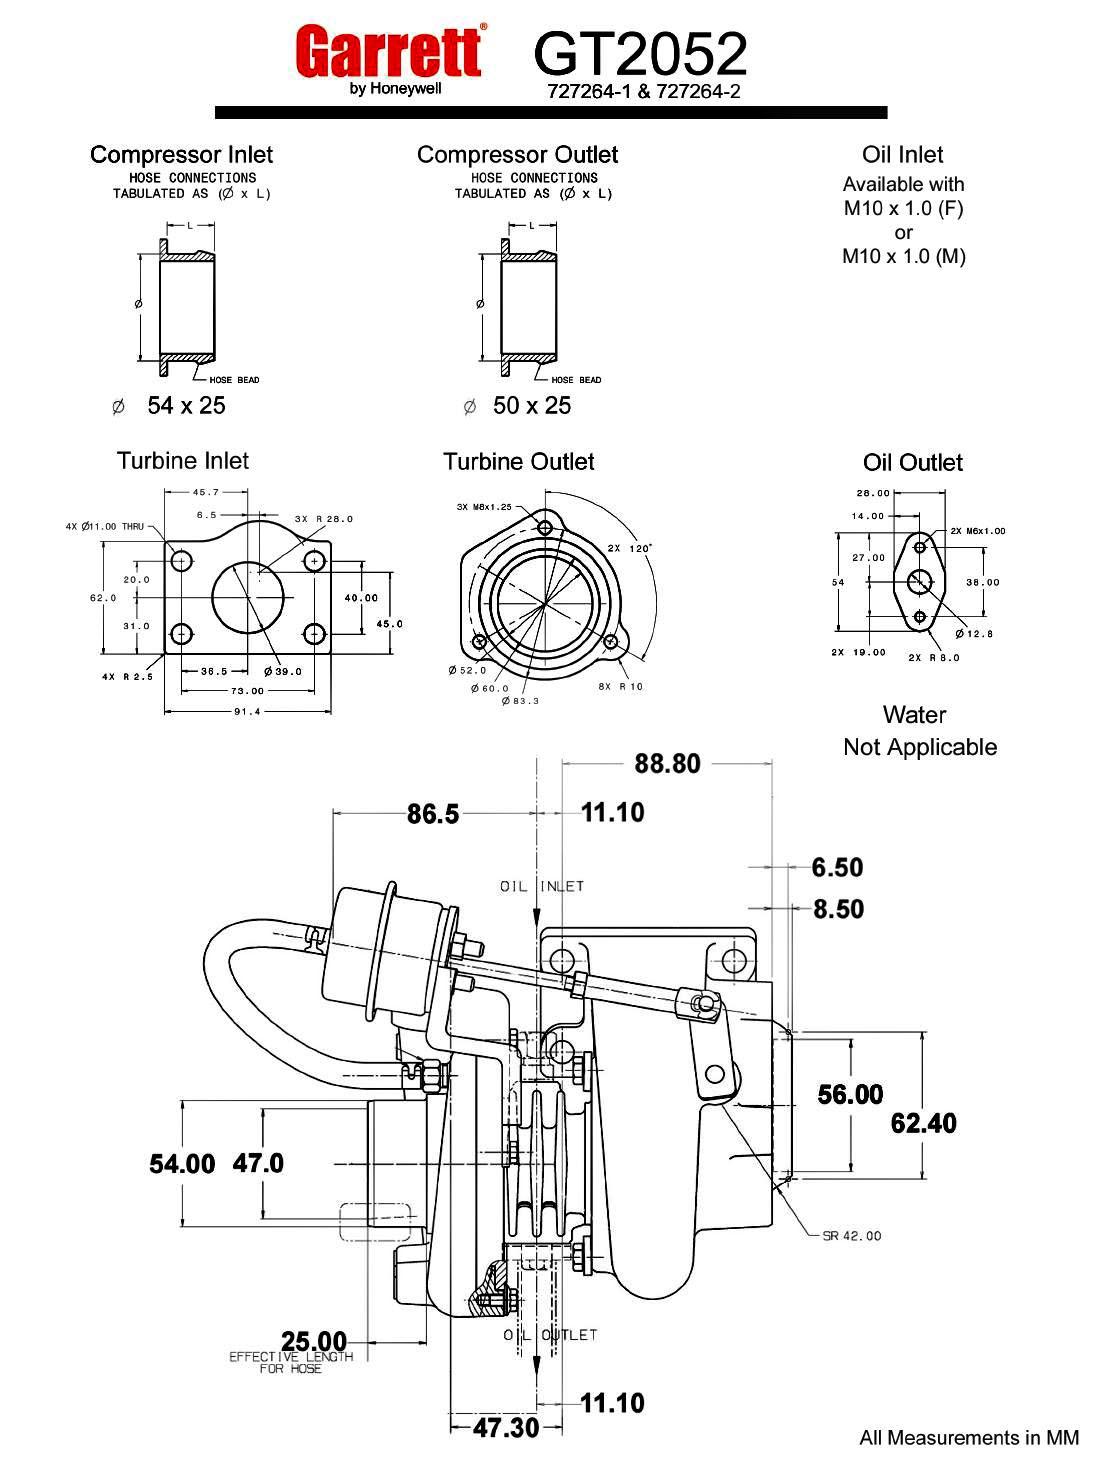 garrett gt20 turbo gt2052 measurements in mm turbocharger flanges diameter turbo flange honeywell 1098x1468 [ 1098 x 1468 Pixel ]